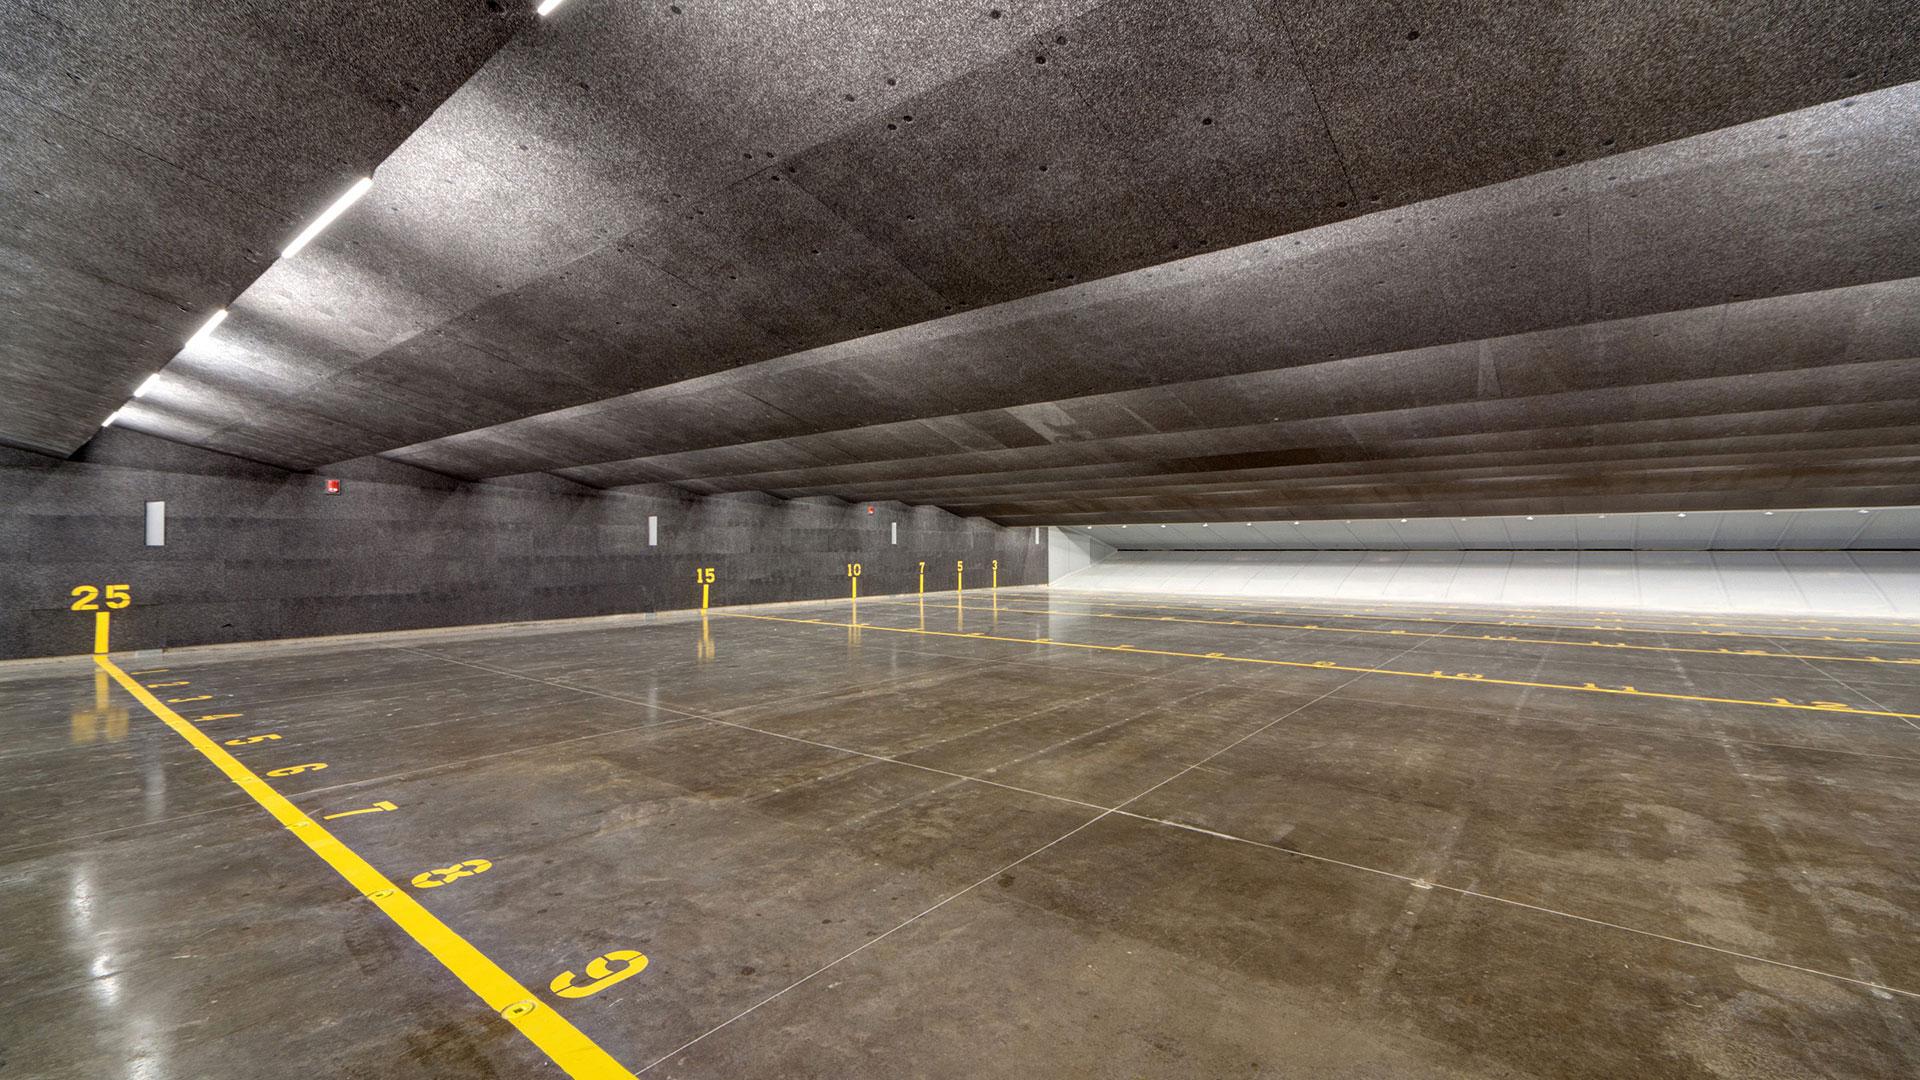 Police firing range vlk architects - Tarrant county college interior design ...